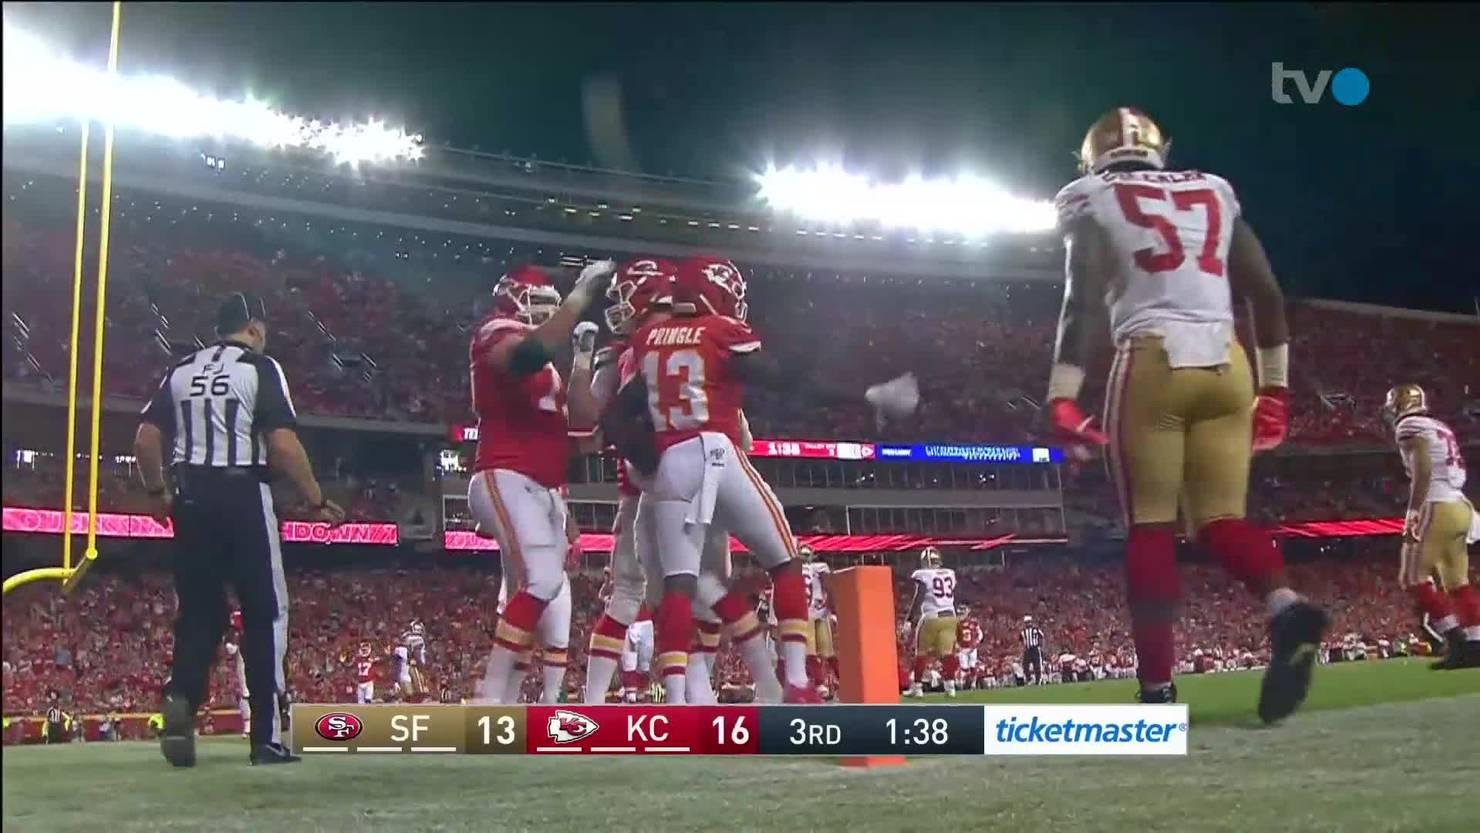 Super Bowl übertragung